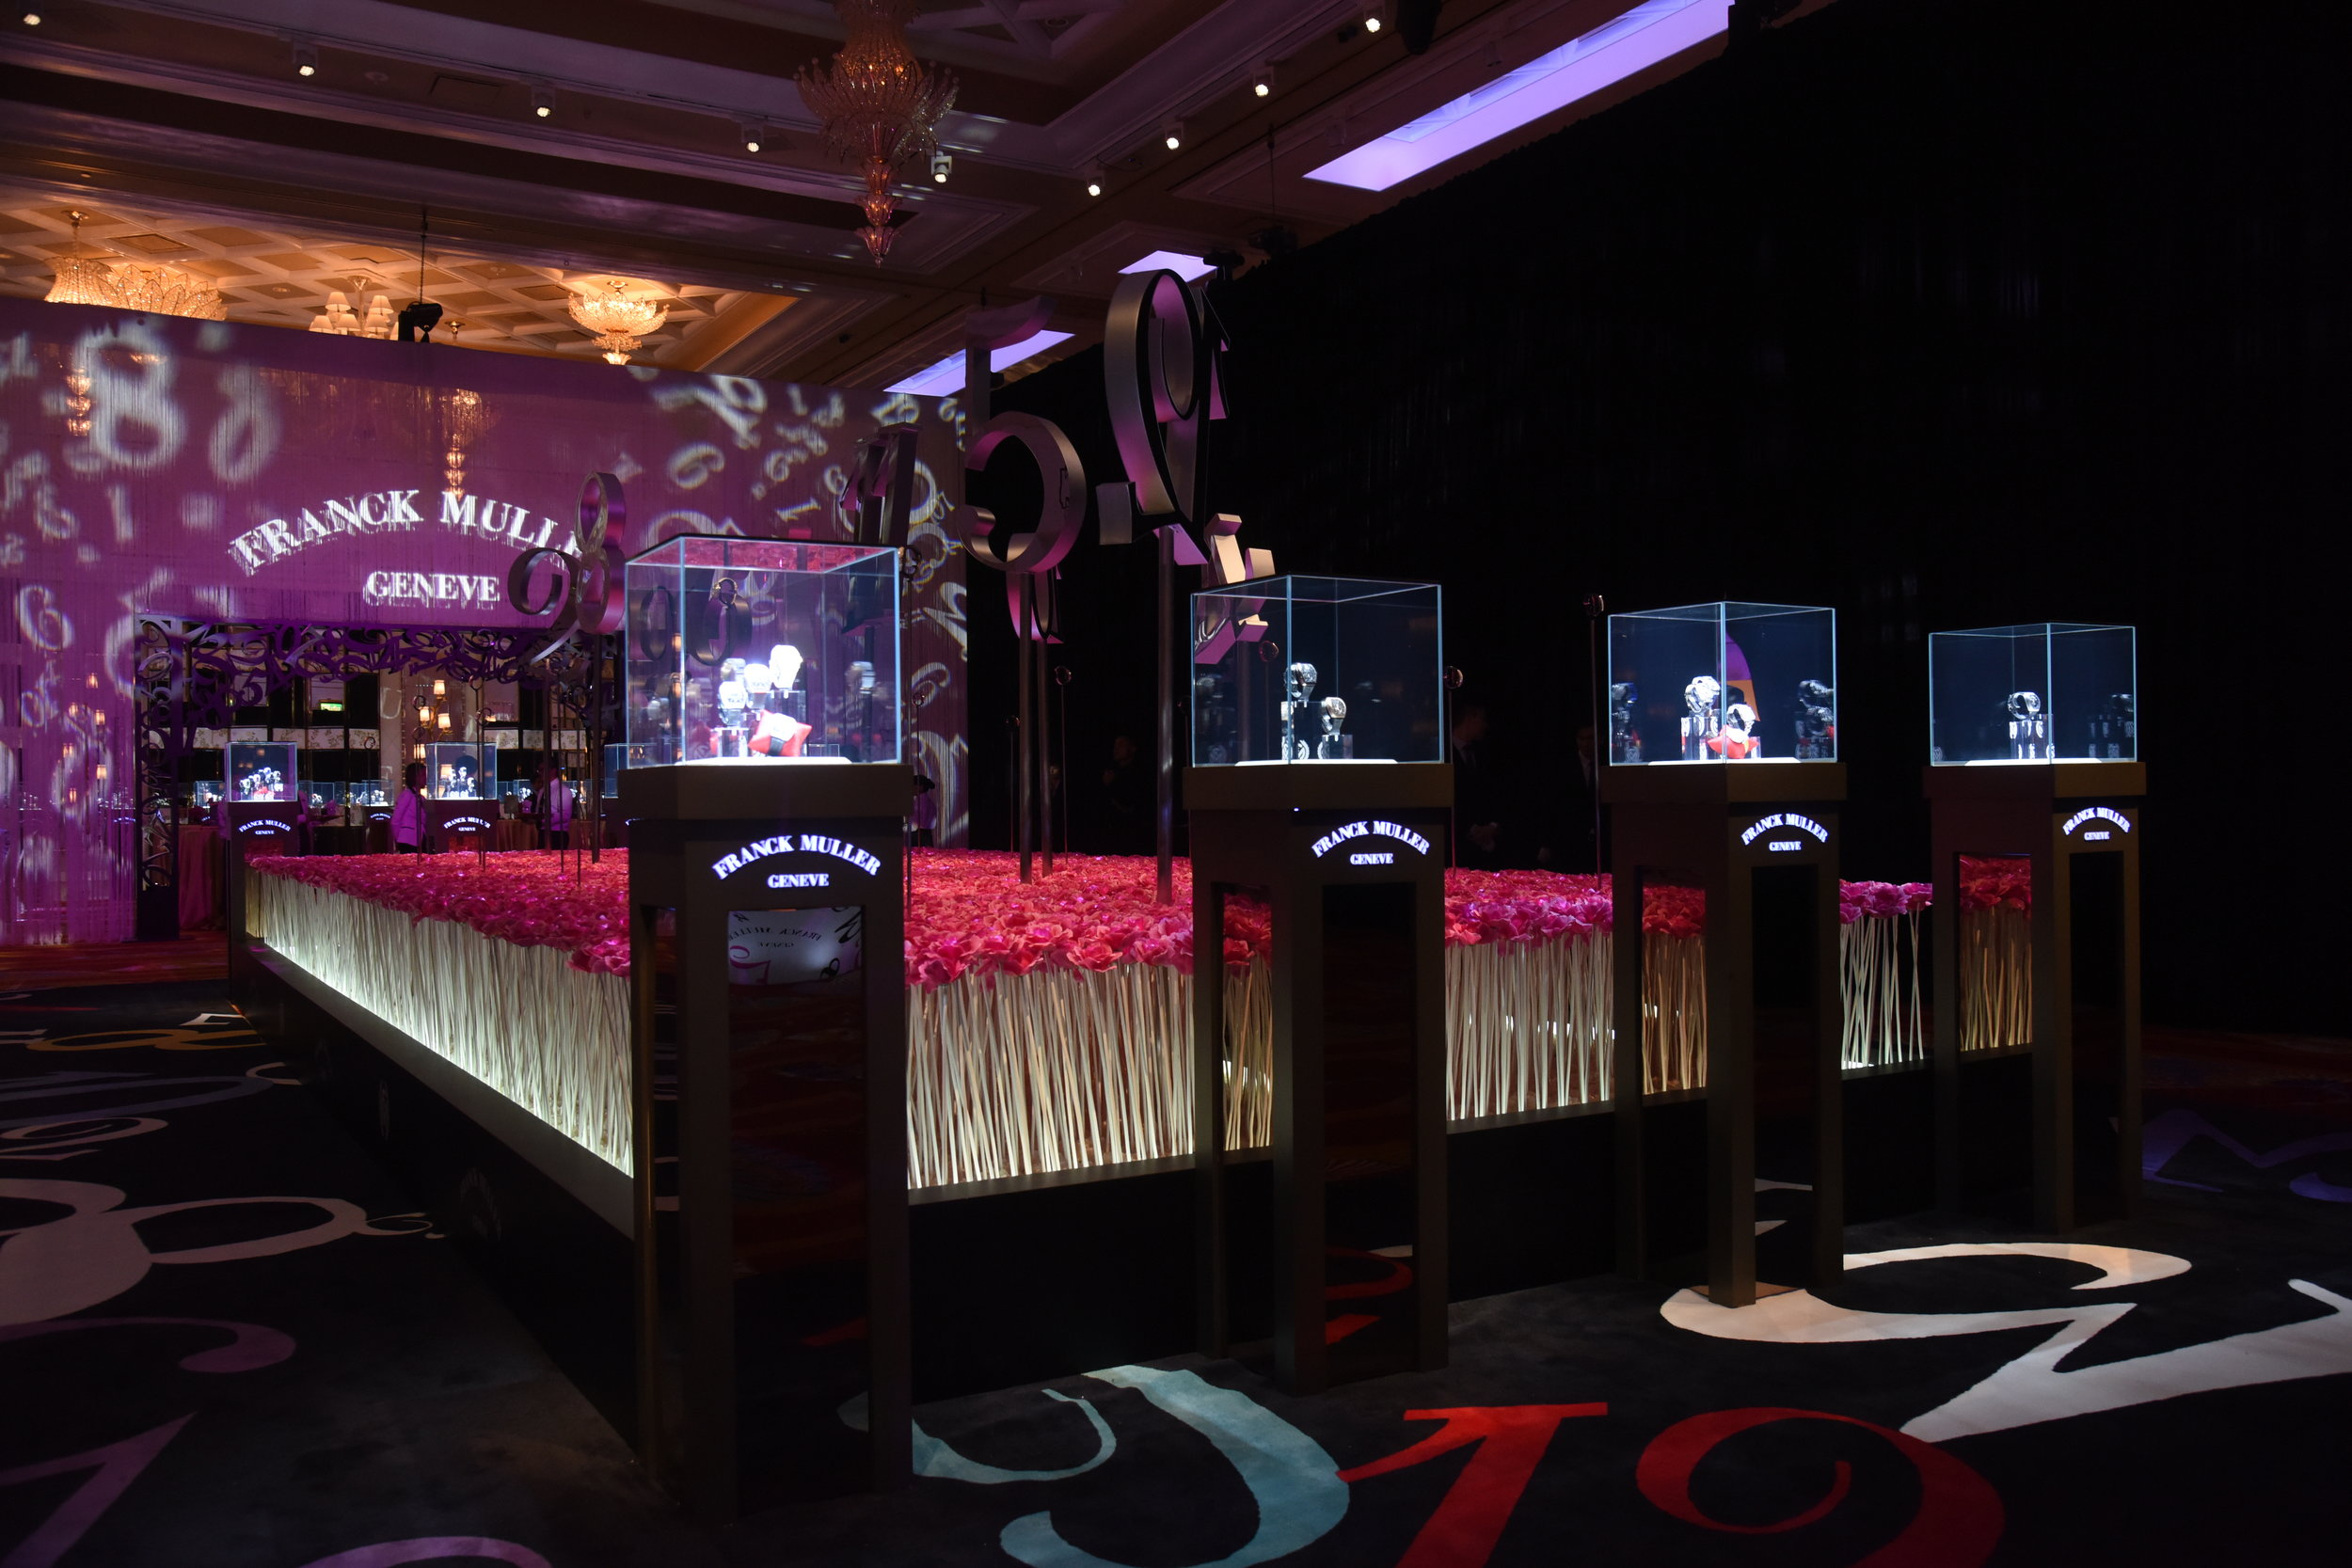 Franck-Muller-Grand-Opening-Macau-Display.JPG